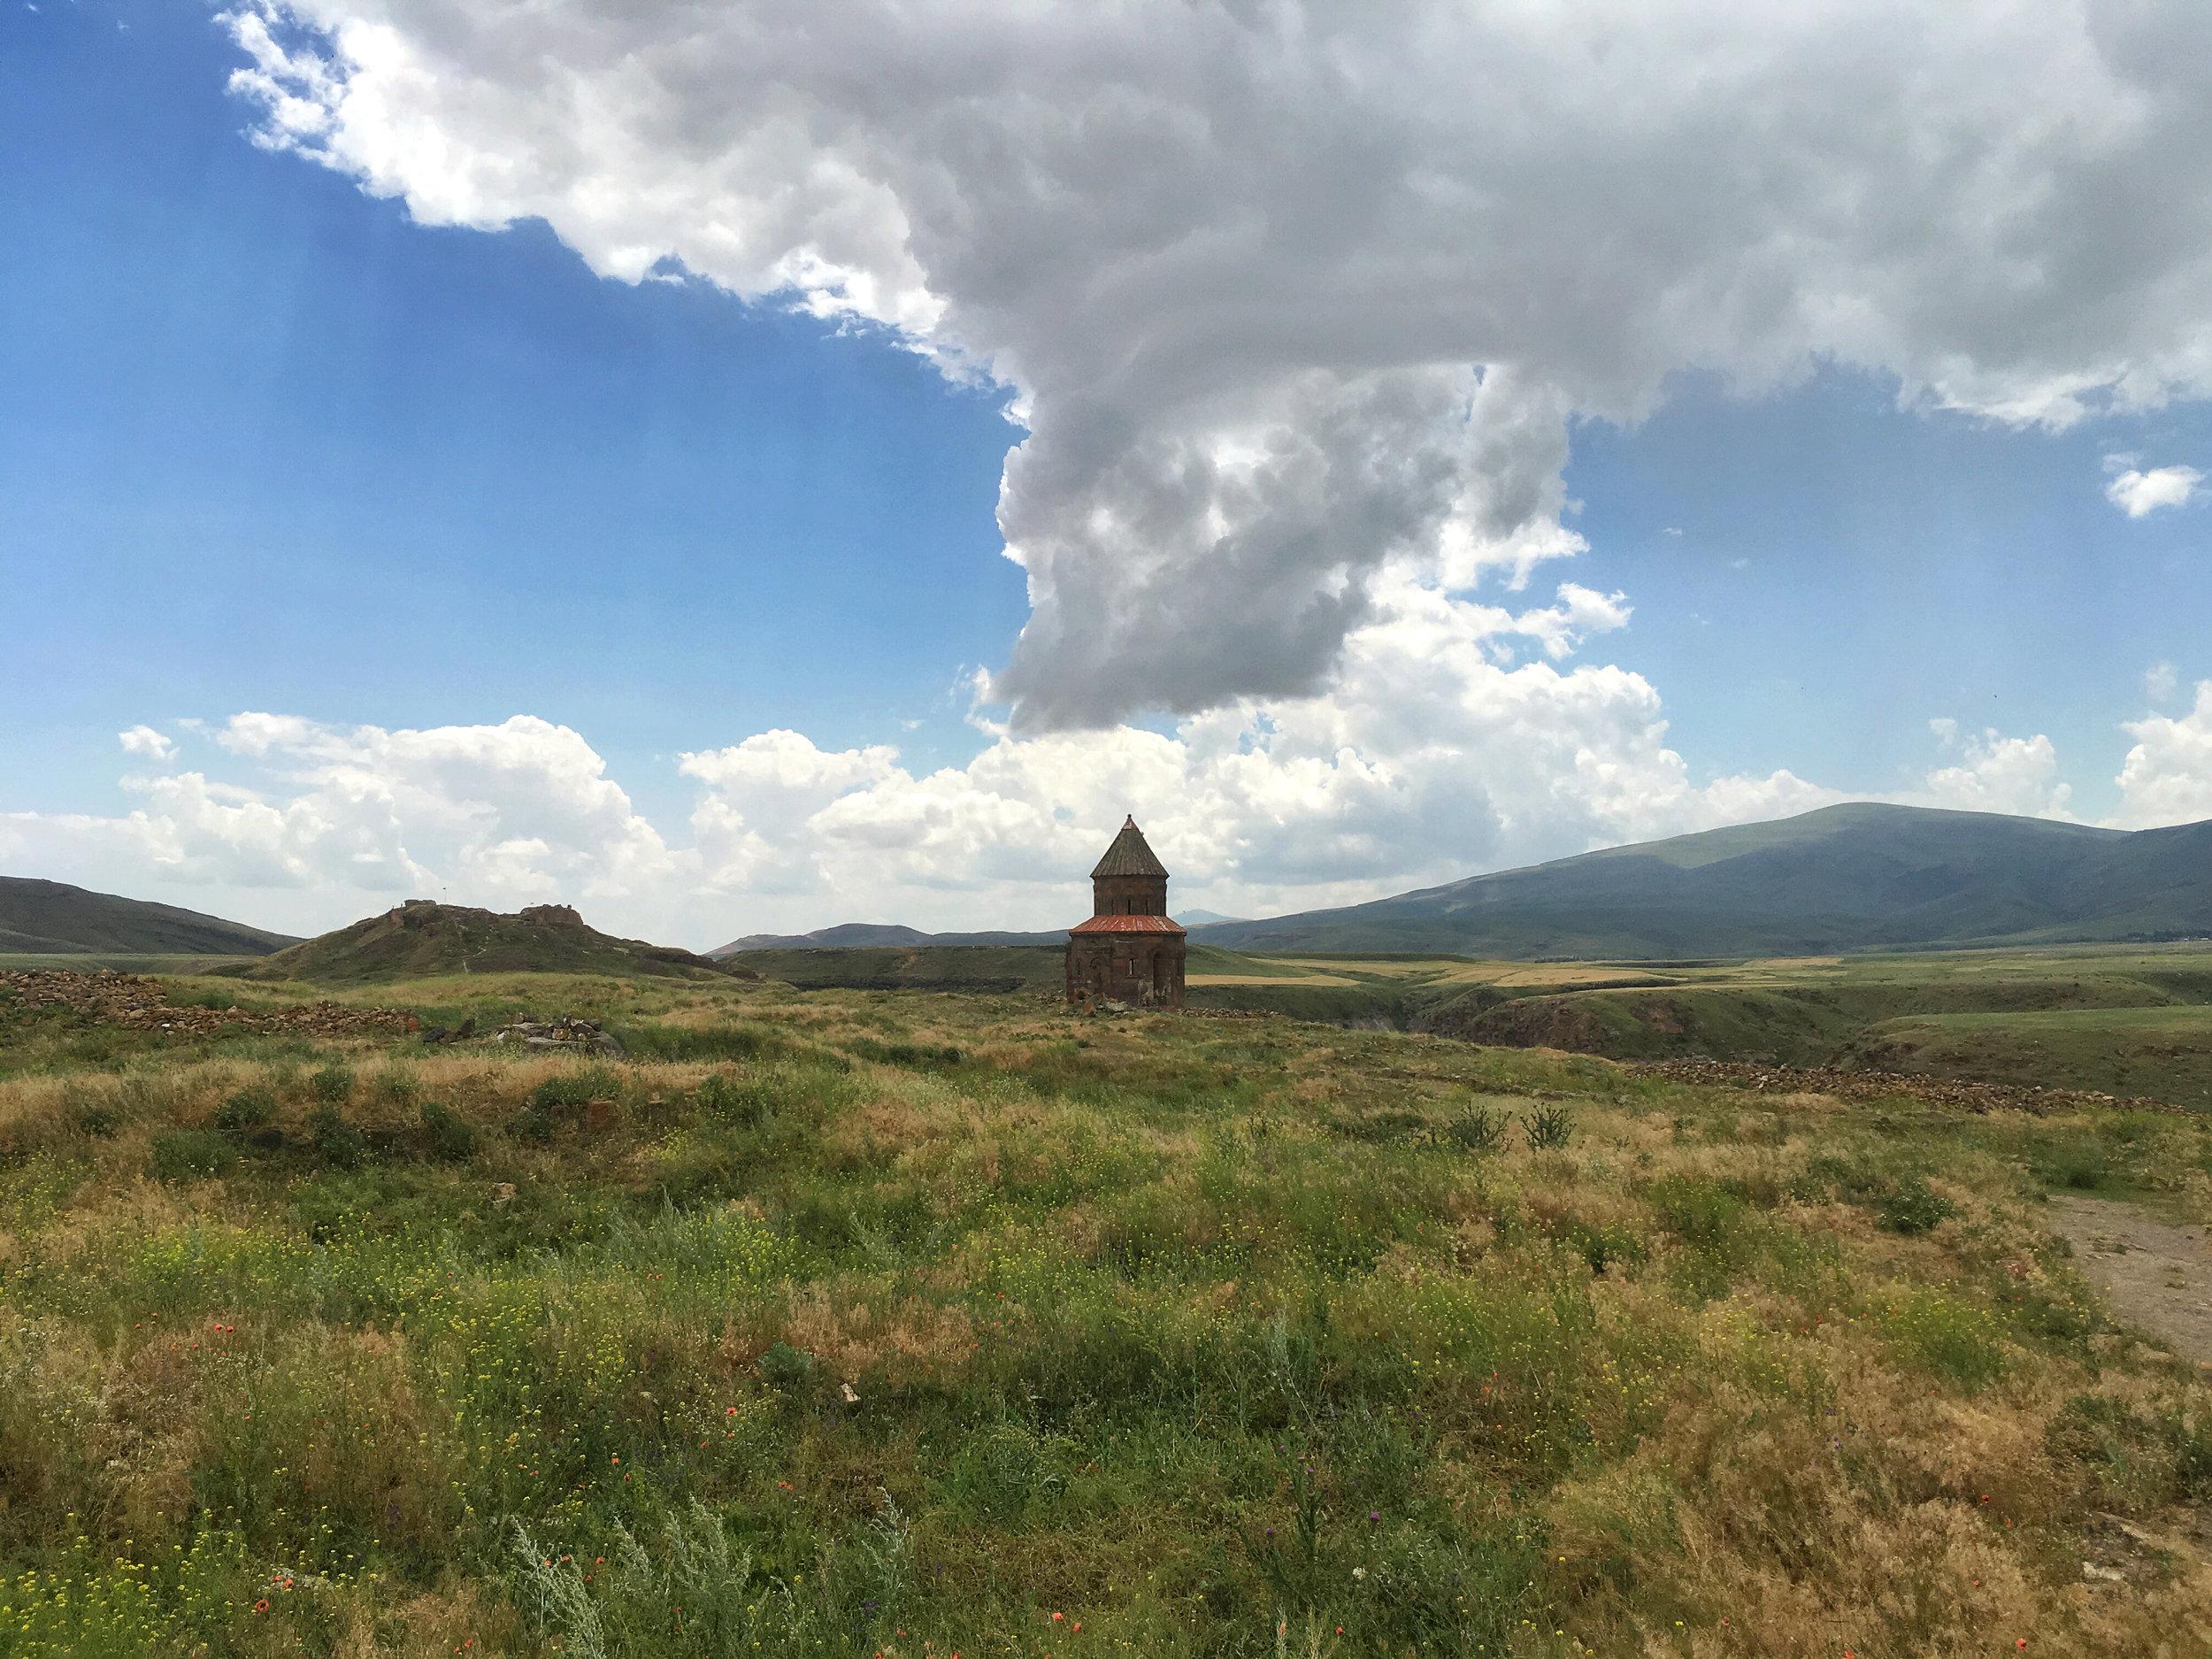 A Georgian Orthodox church stands alone